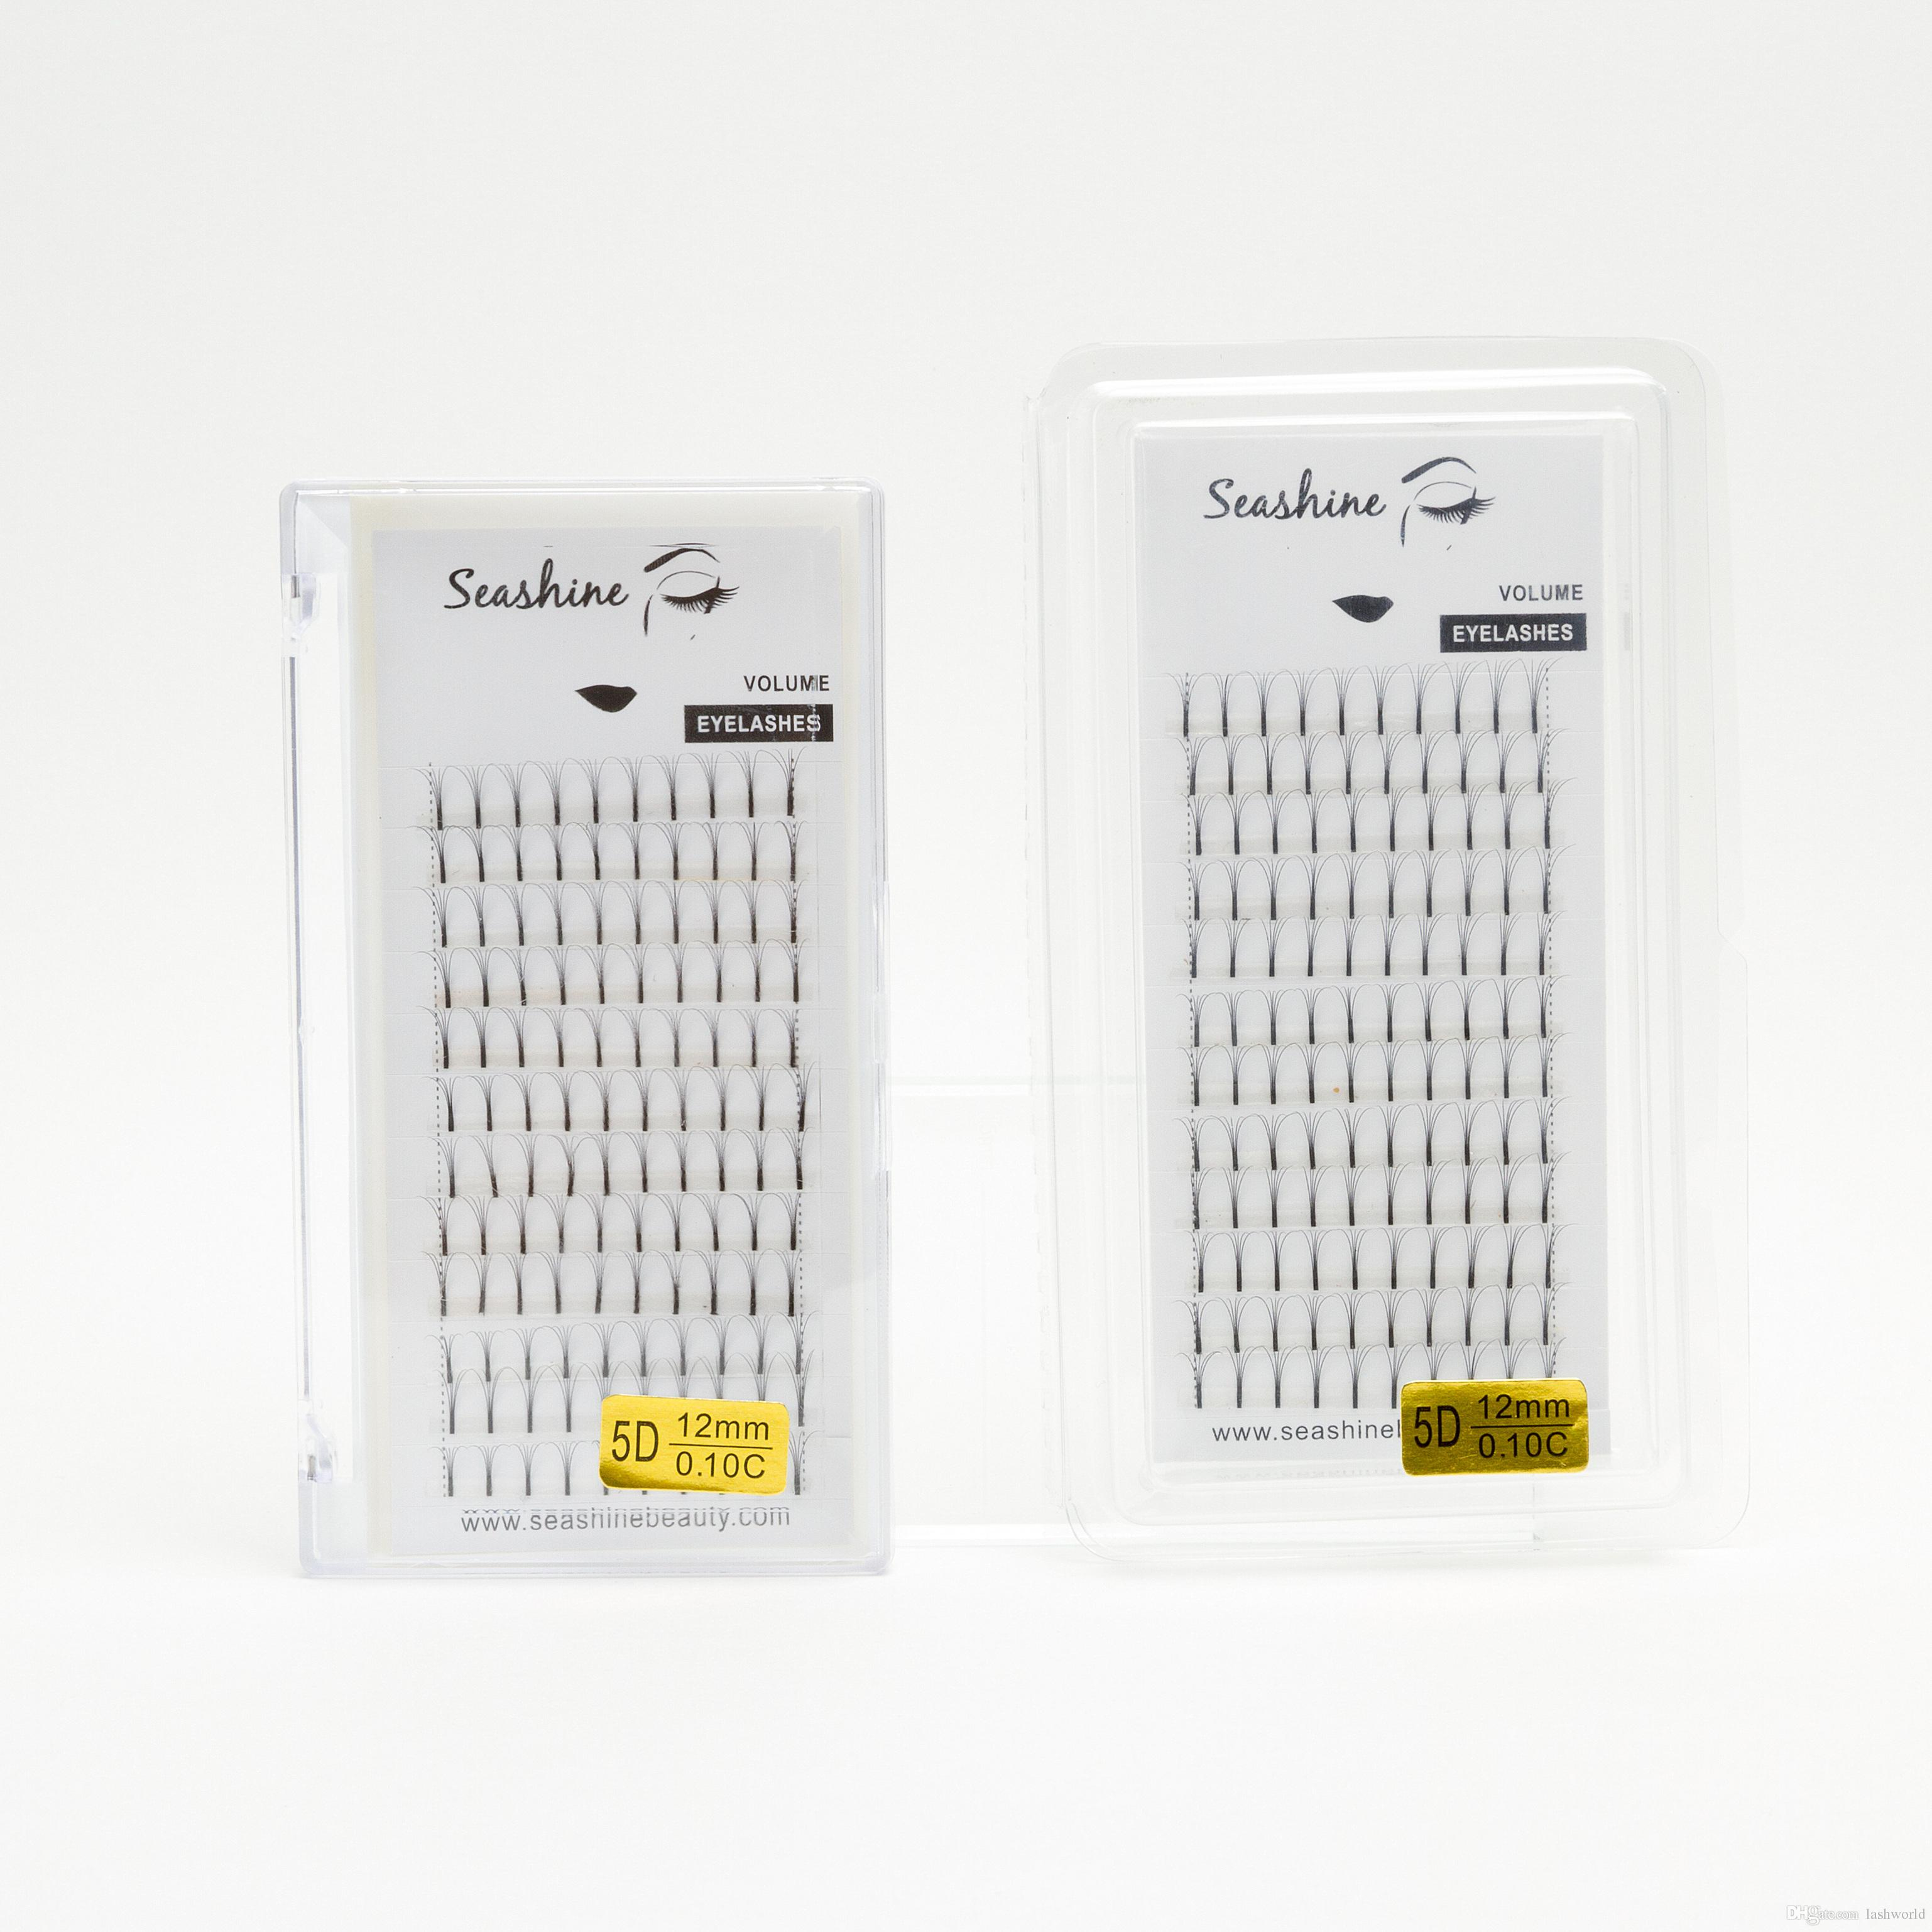 Seashine low prices false eyelashes russian volume 5d pre fanned eyelash CD curl 8-15 mm single length